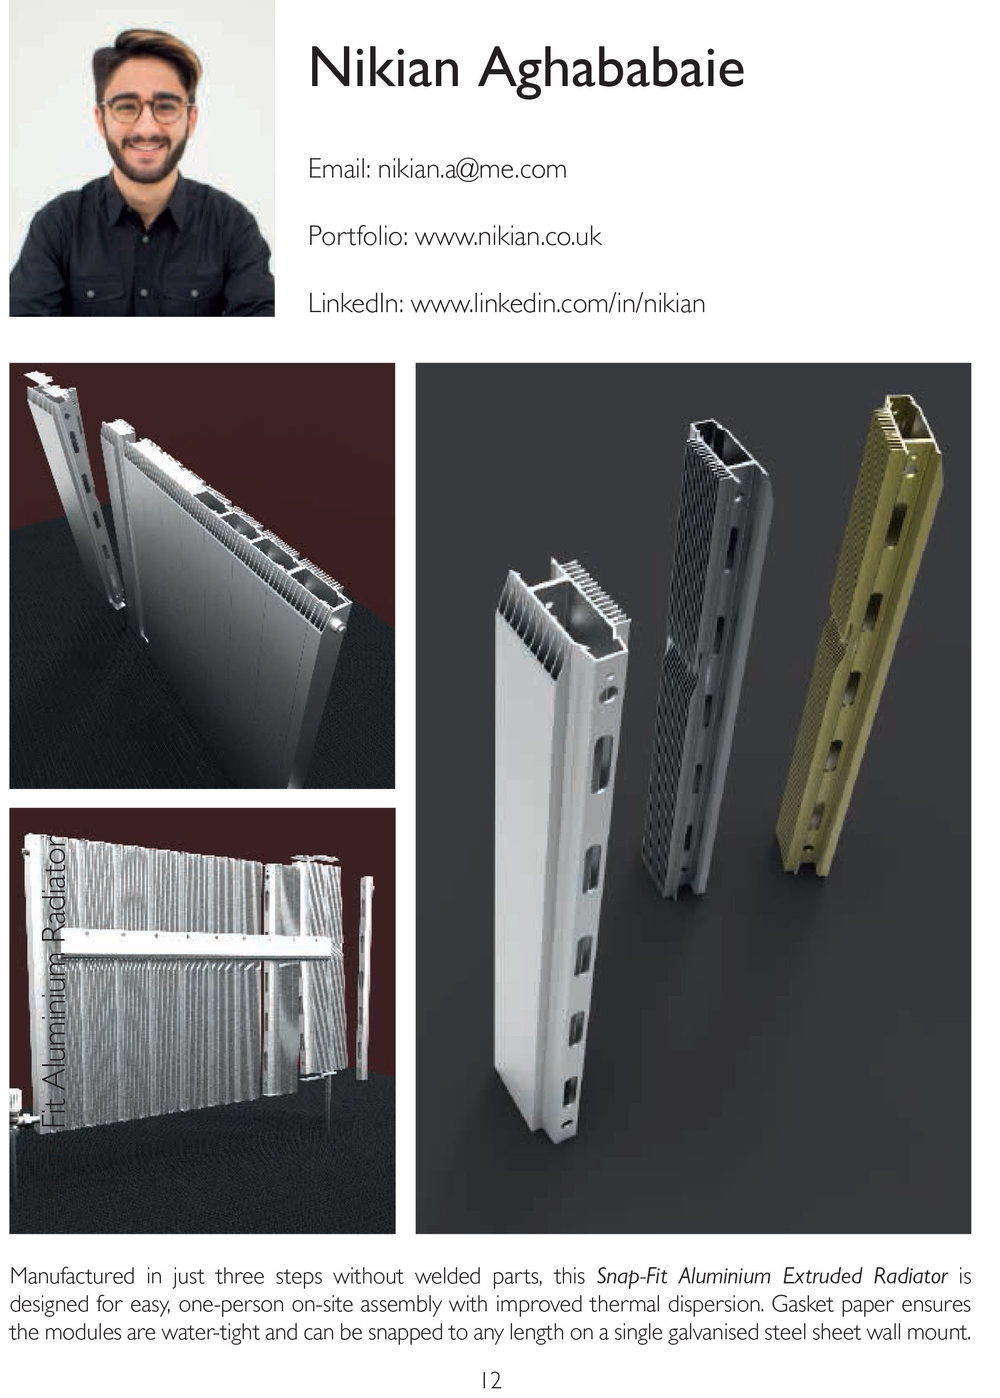 BSc Product Design - Brochure - NTU Degree Show 2017-14.jpg